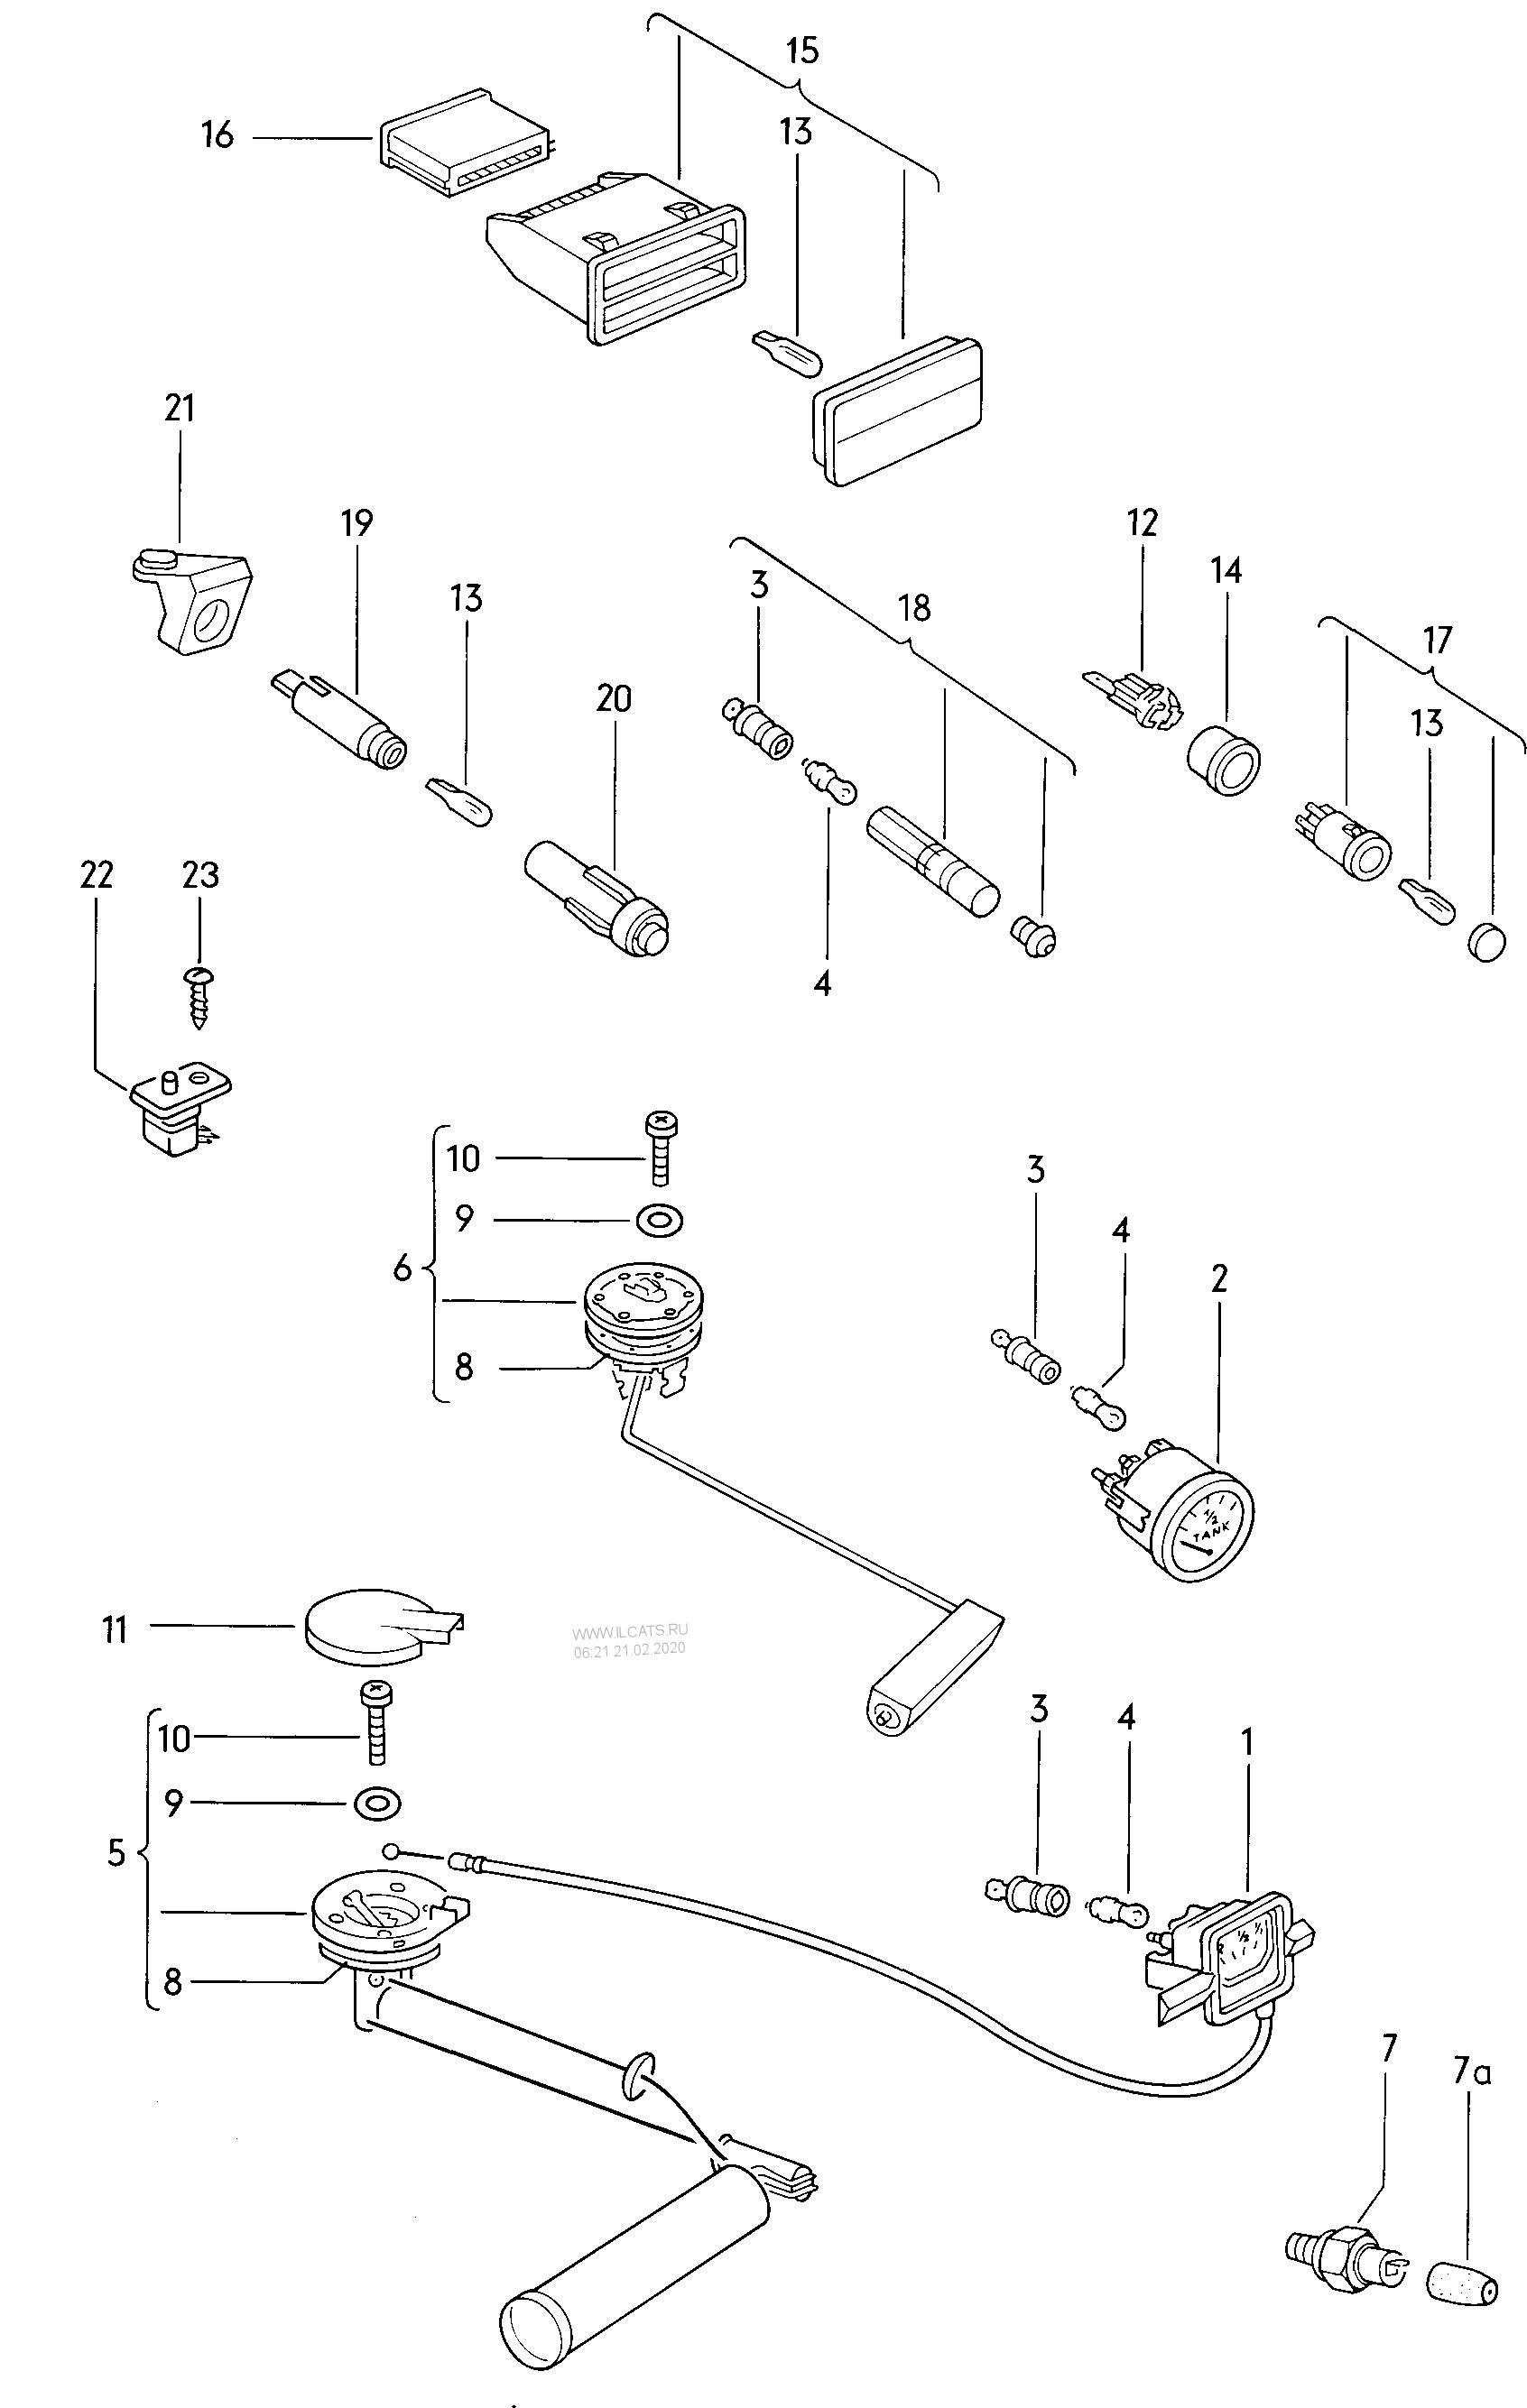 Vdo Oil Pressure Gauge Wiring Ob 2945] Oil Pressure Sender Switch Schematic Wiring Diagram Of Vdo Oil Pressure Gauge Wiring